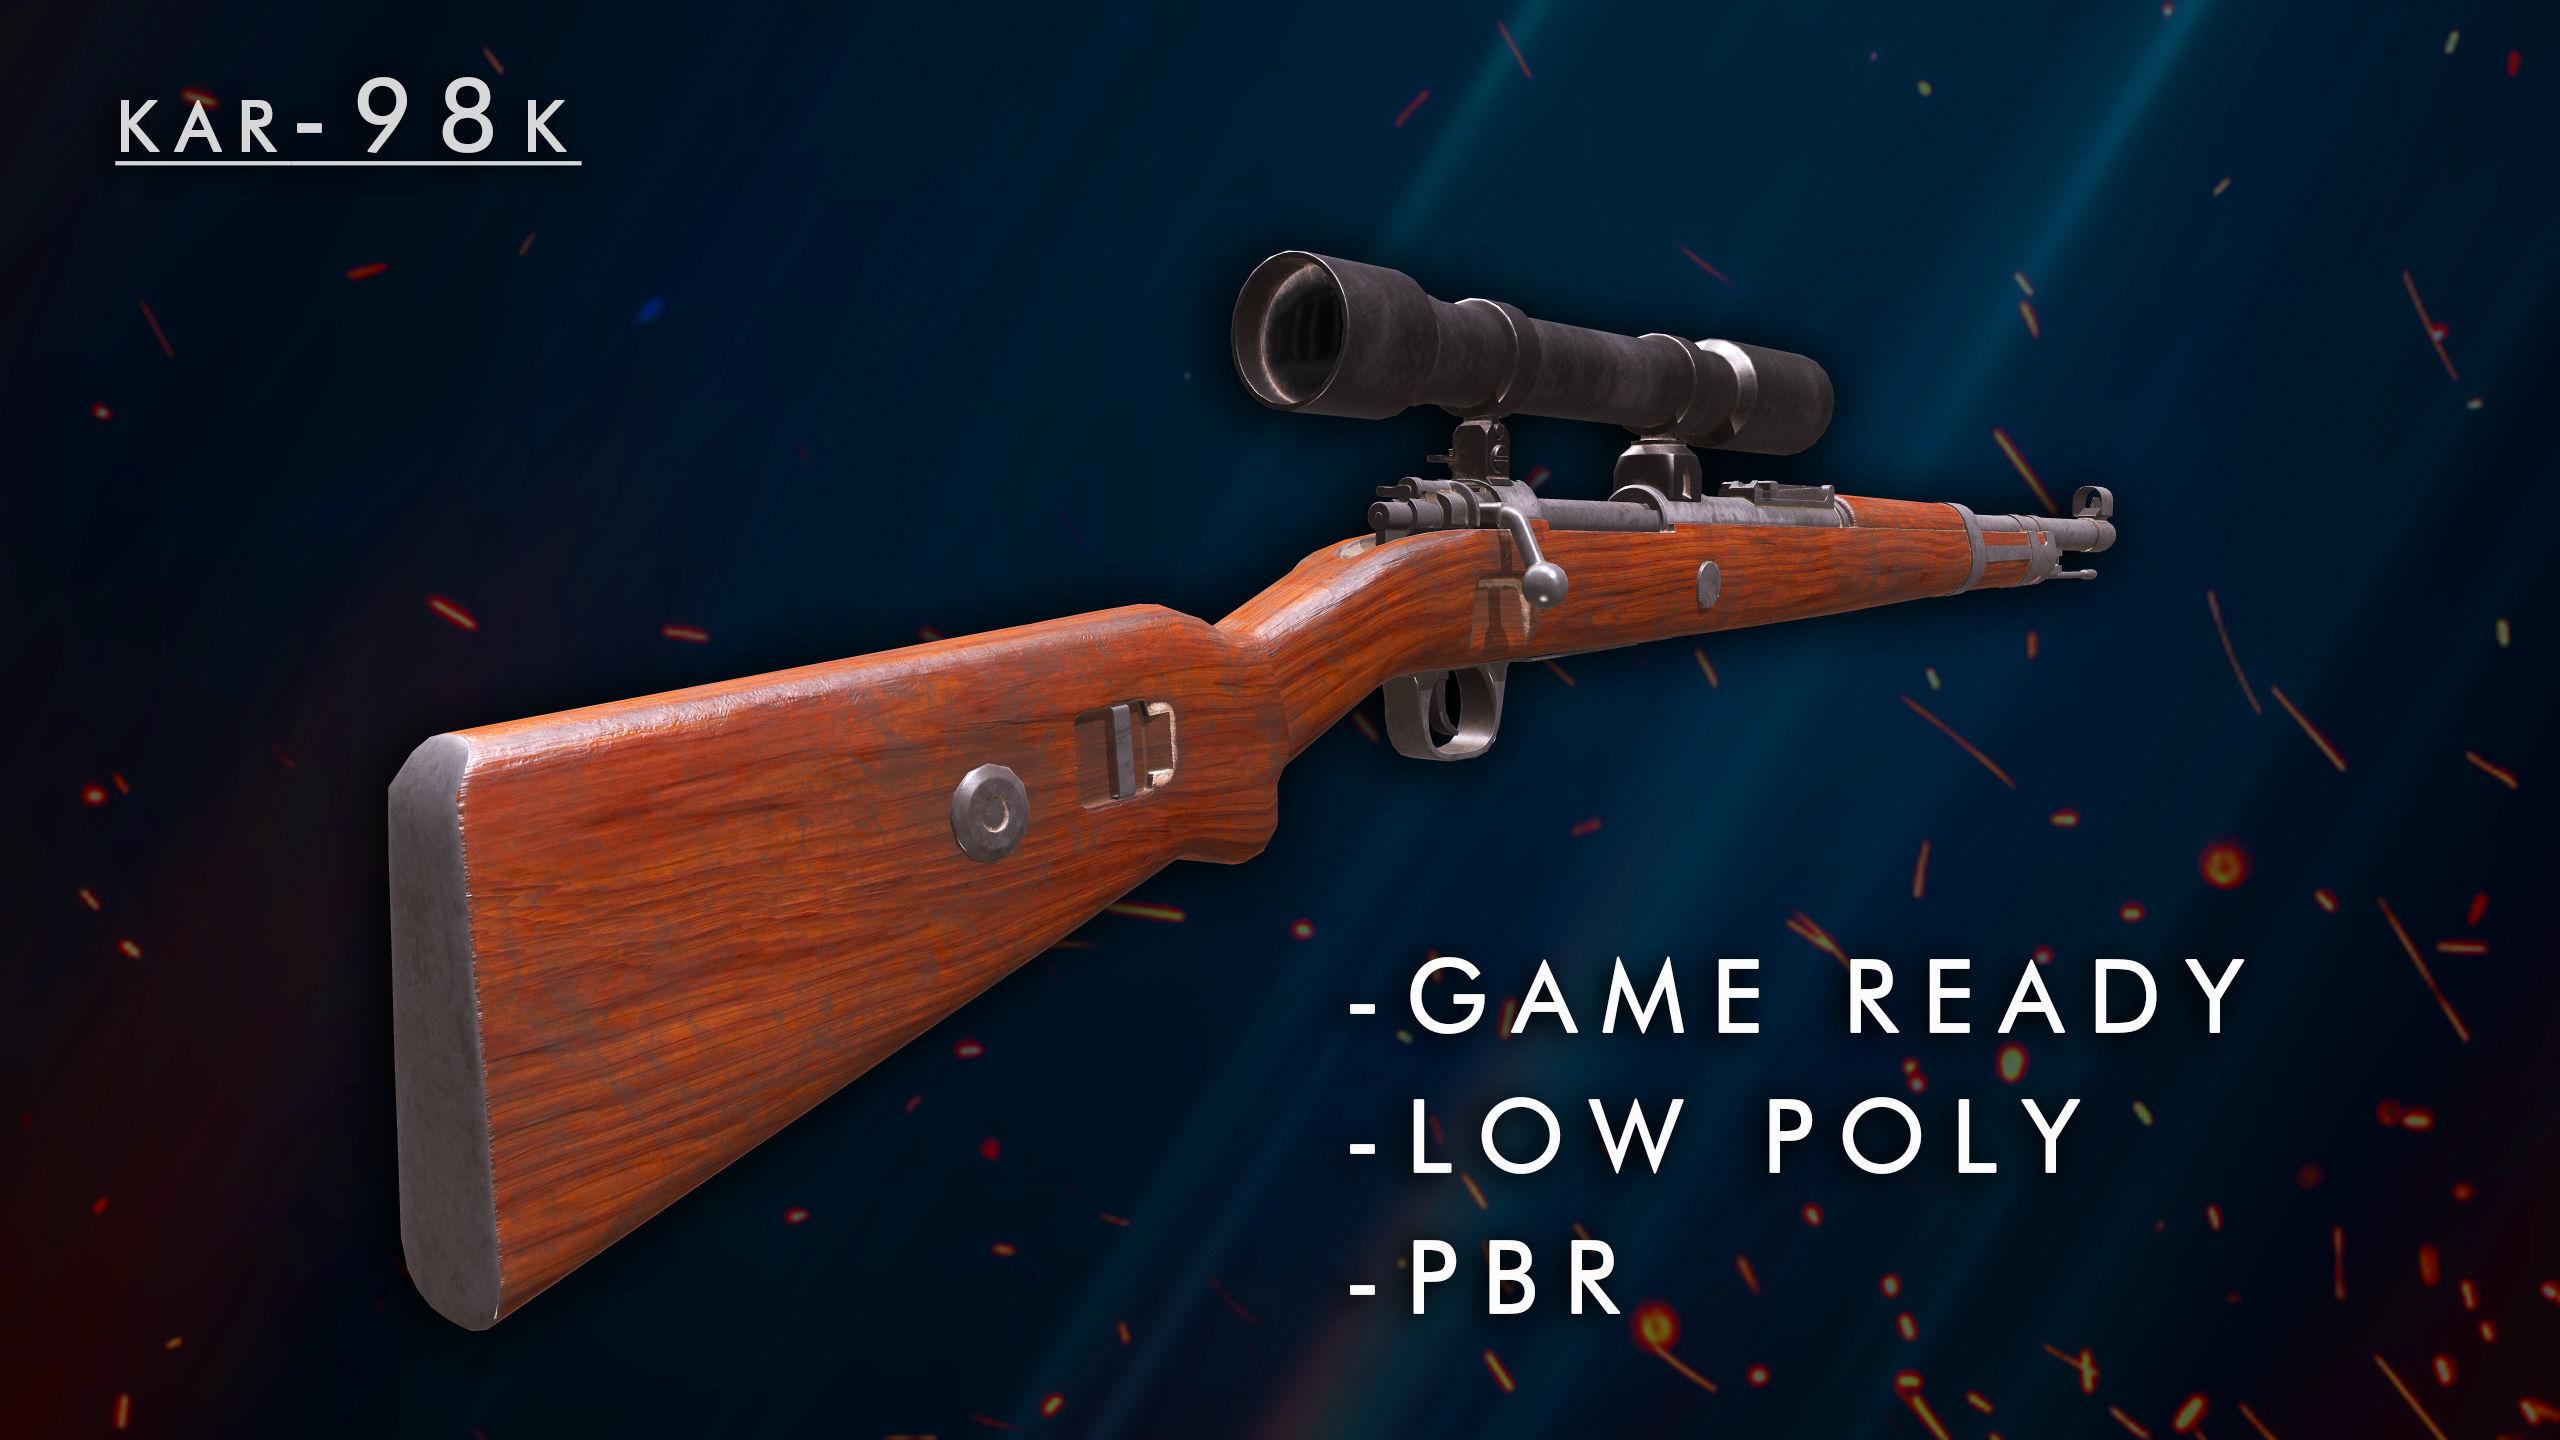 Kar98 low poly sniper rifle